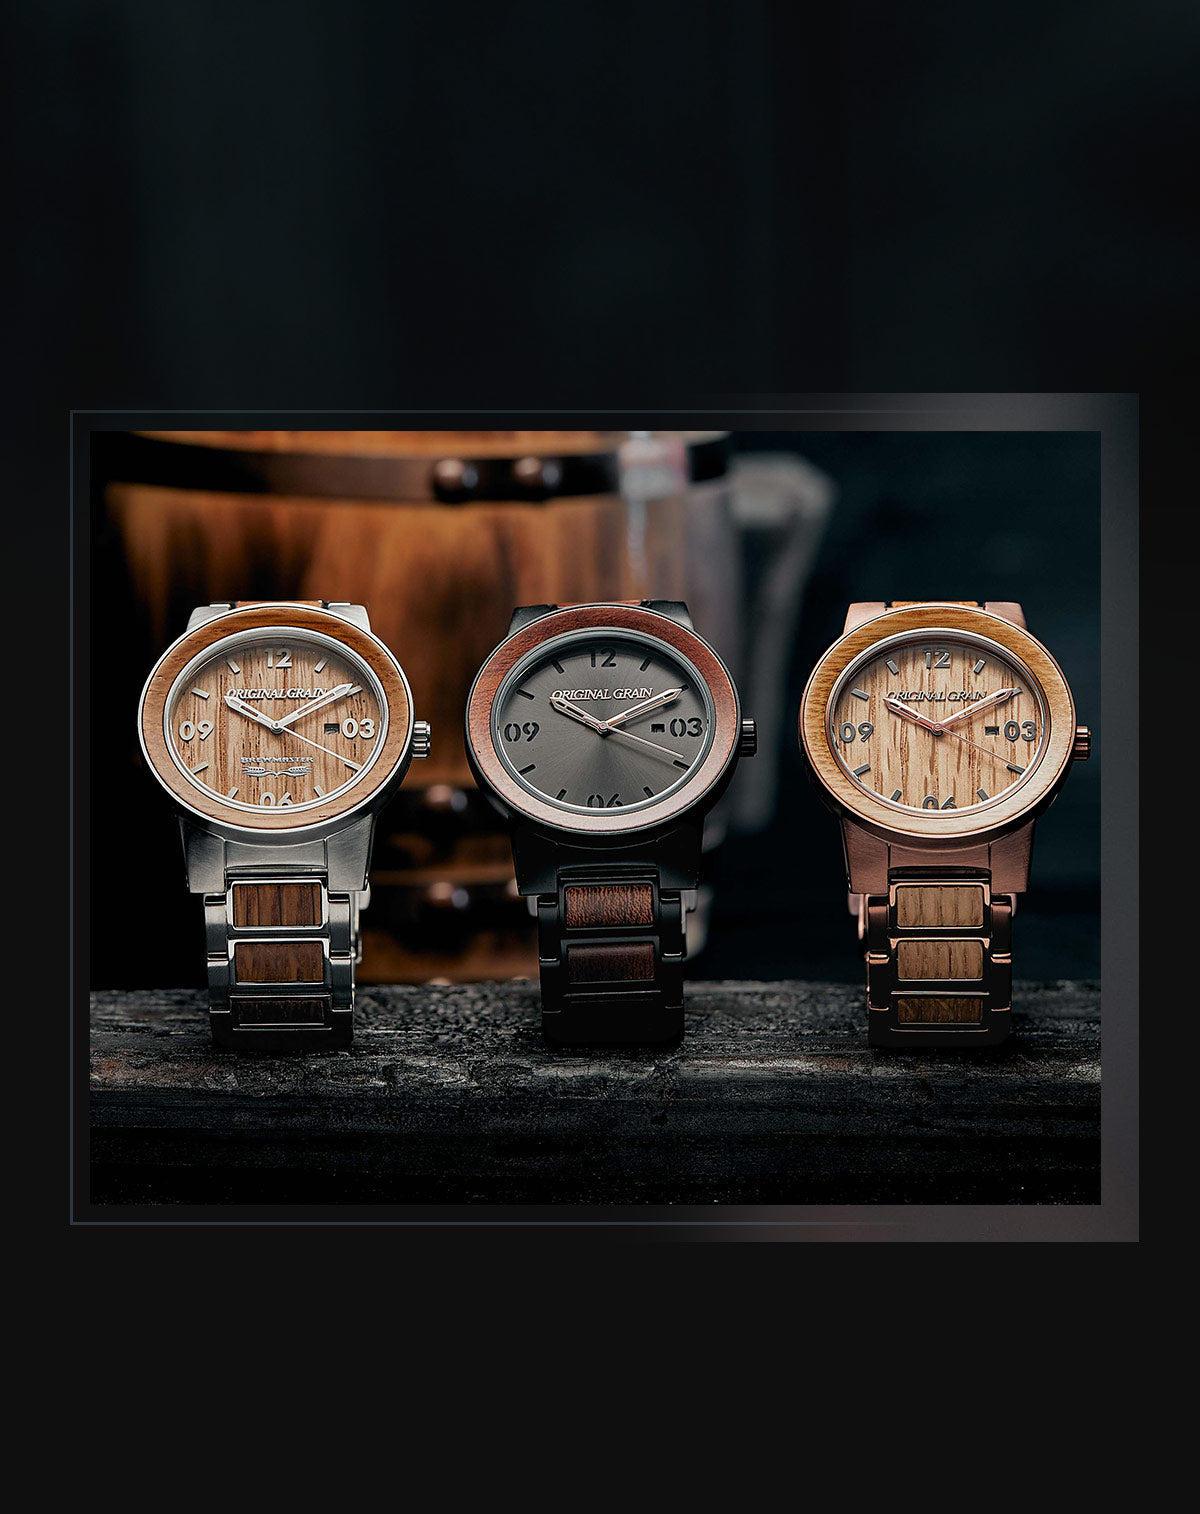 The Premier Maker of Wood & Steel Watches – Original Grain